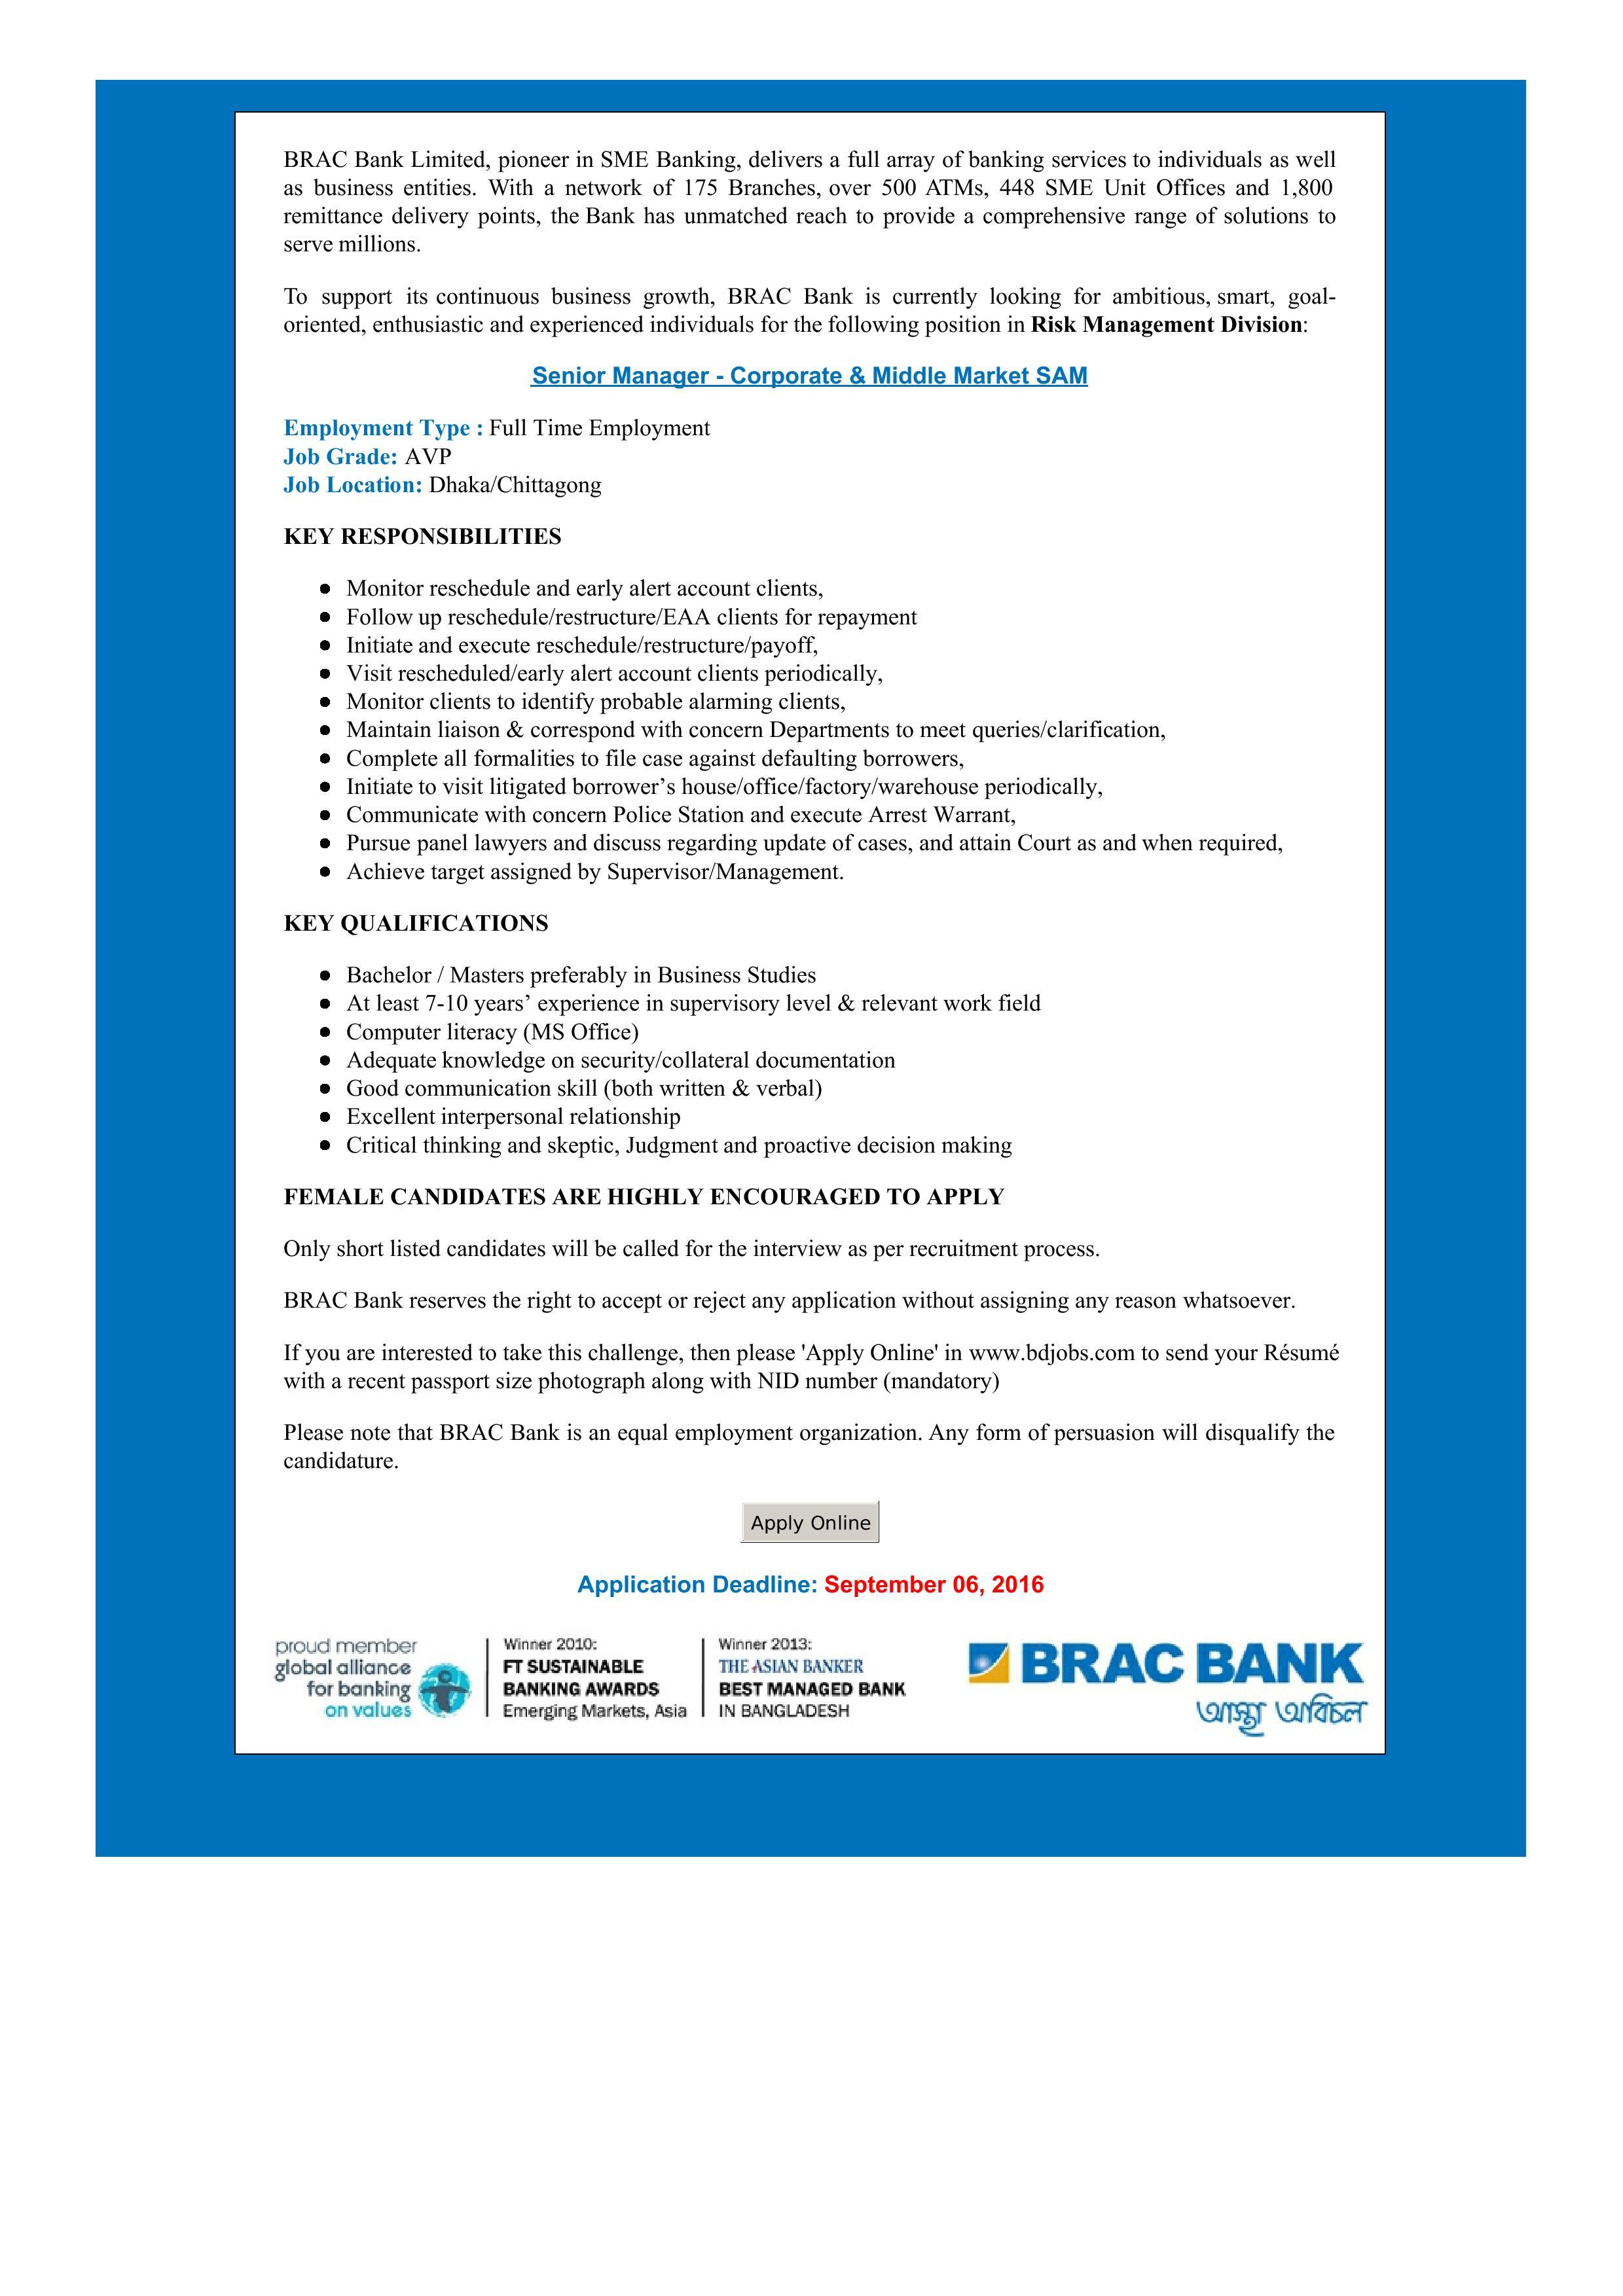 Senior Manager - Corporate & Middle Market SAM